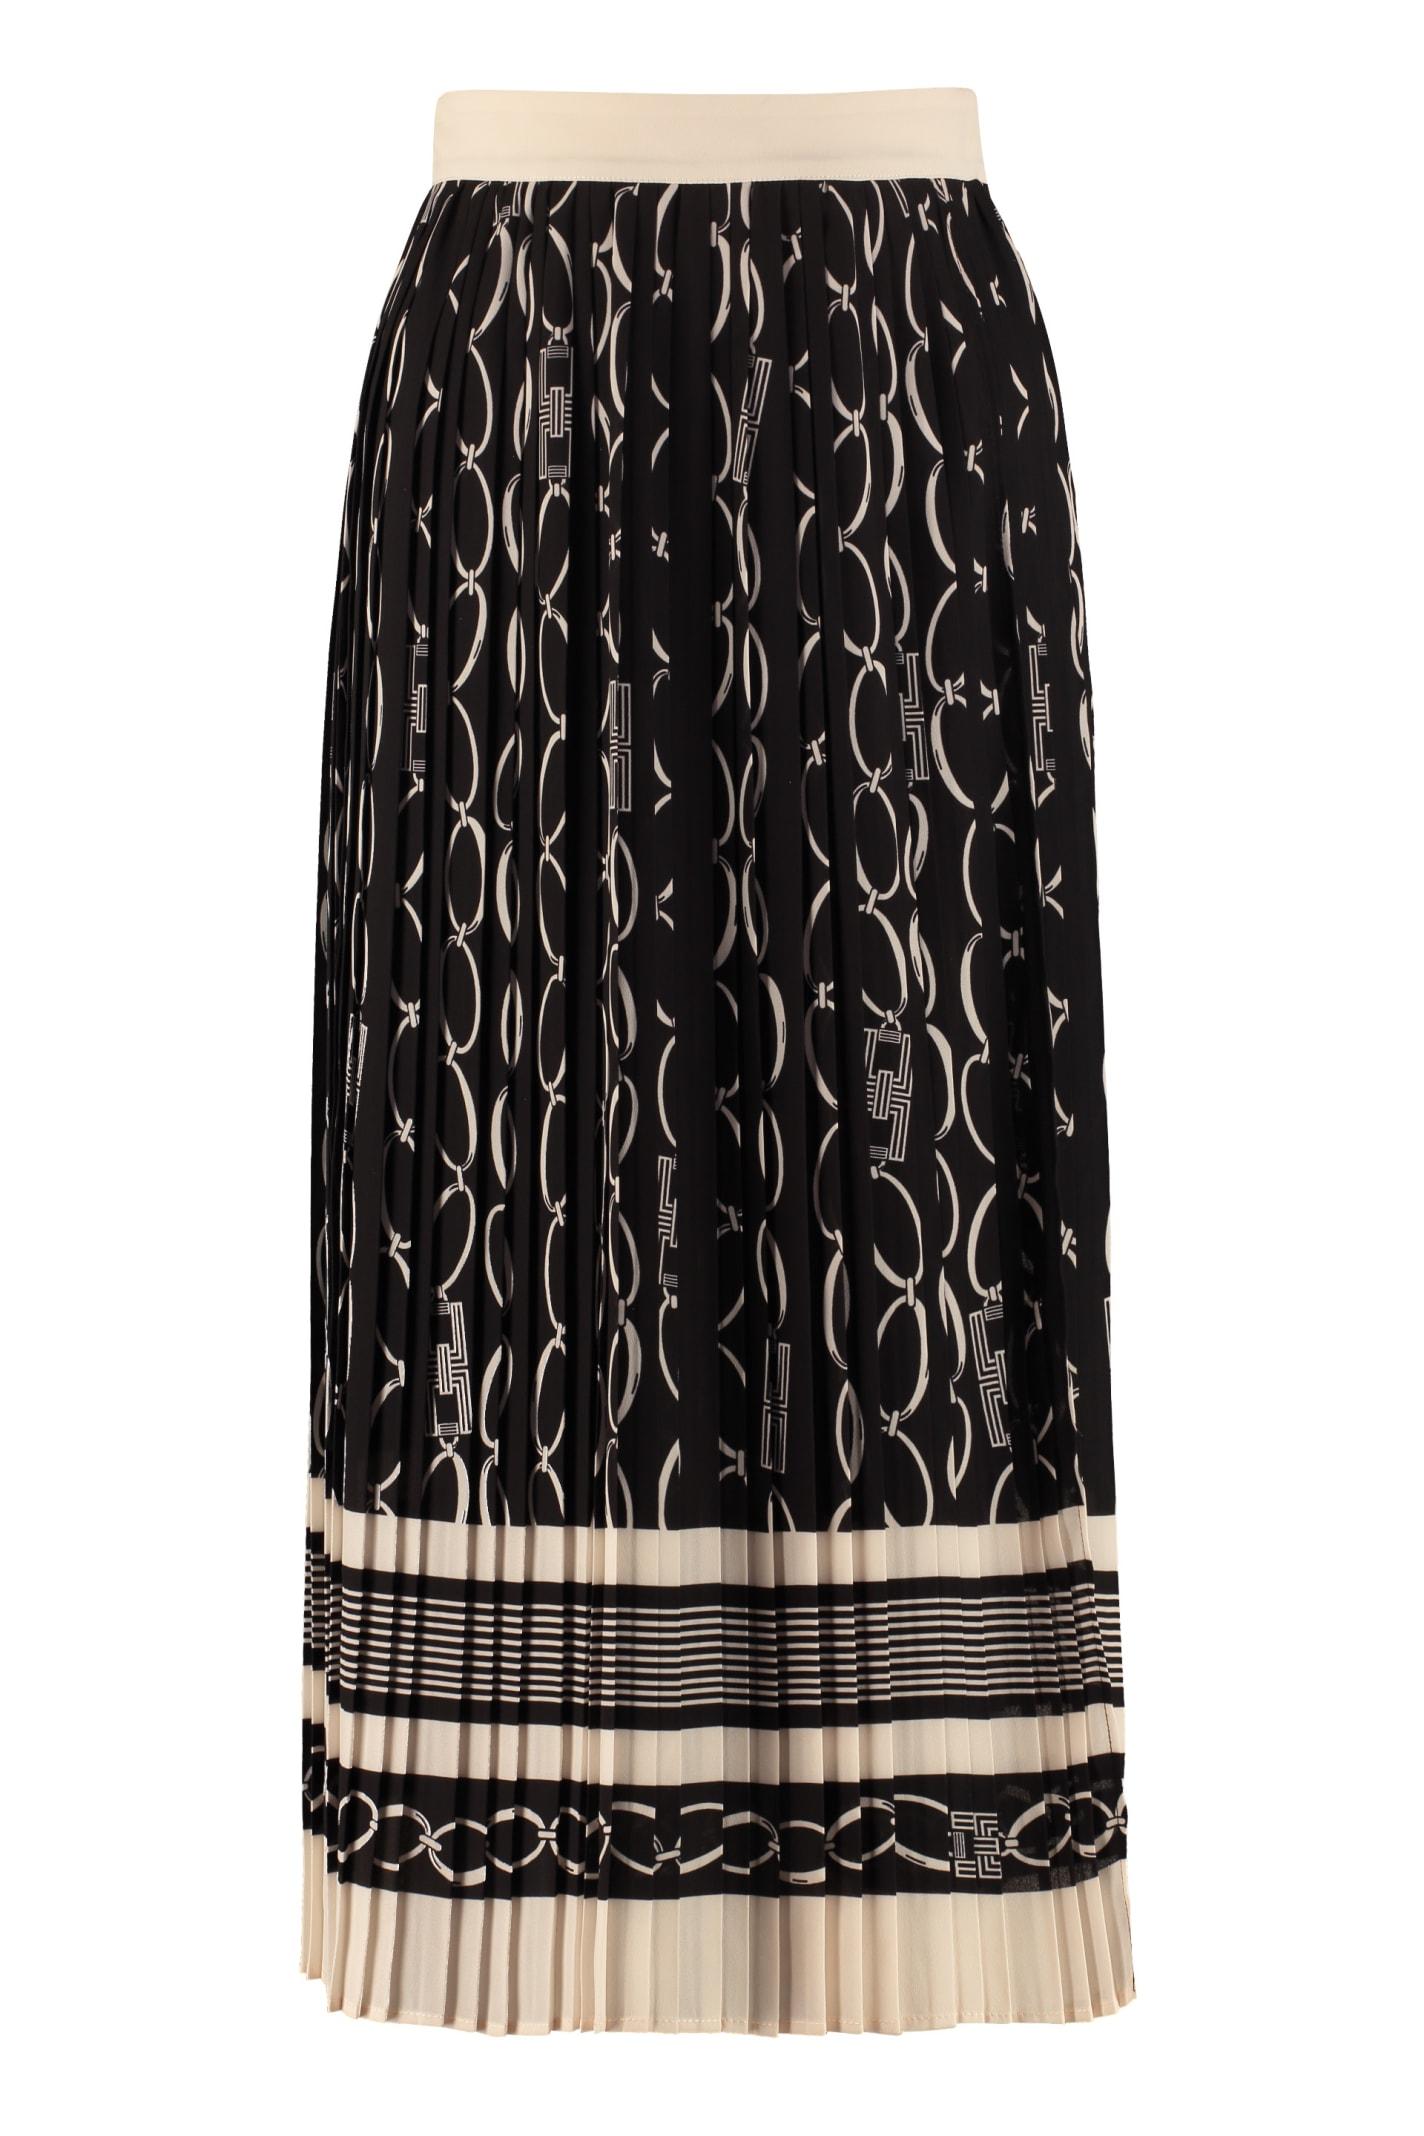 Elisabetta Franchi Printed Pleated Skirt